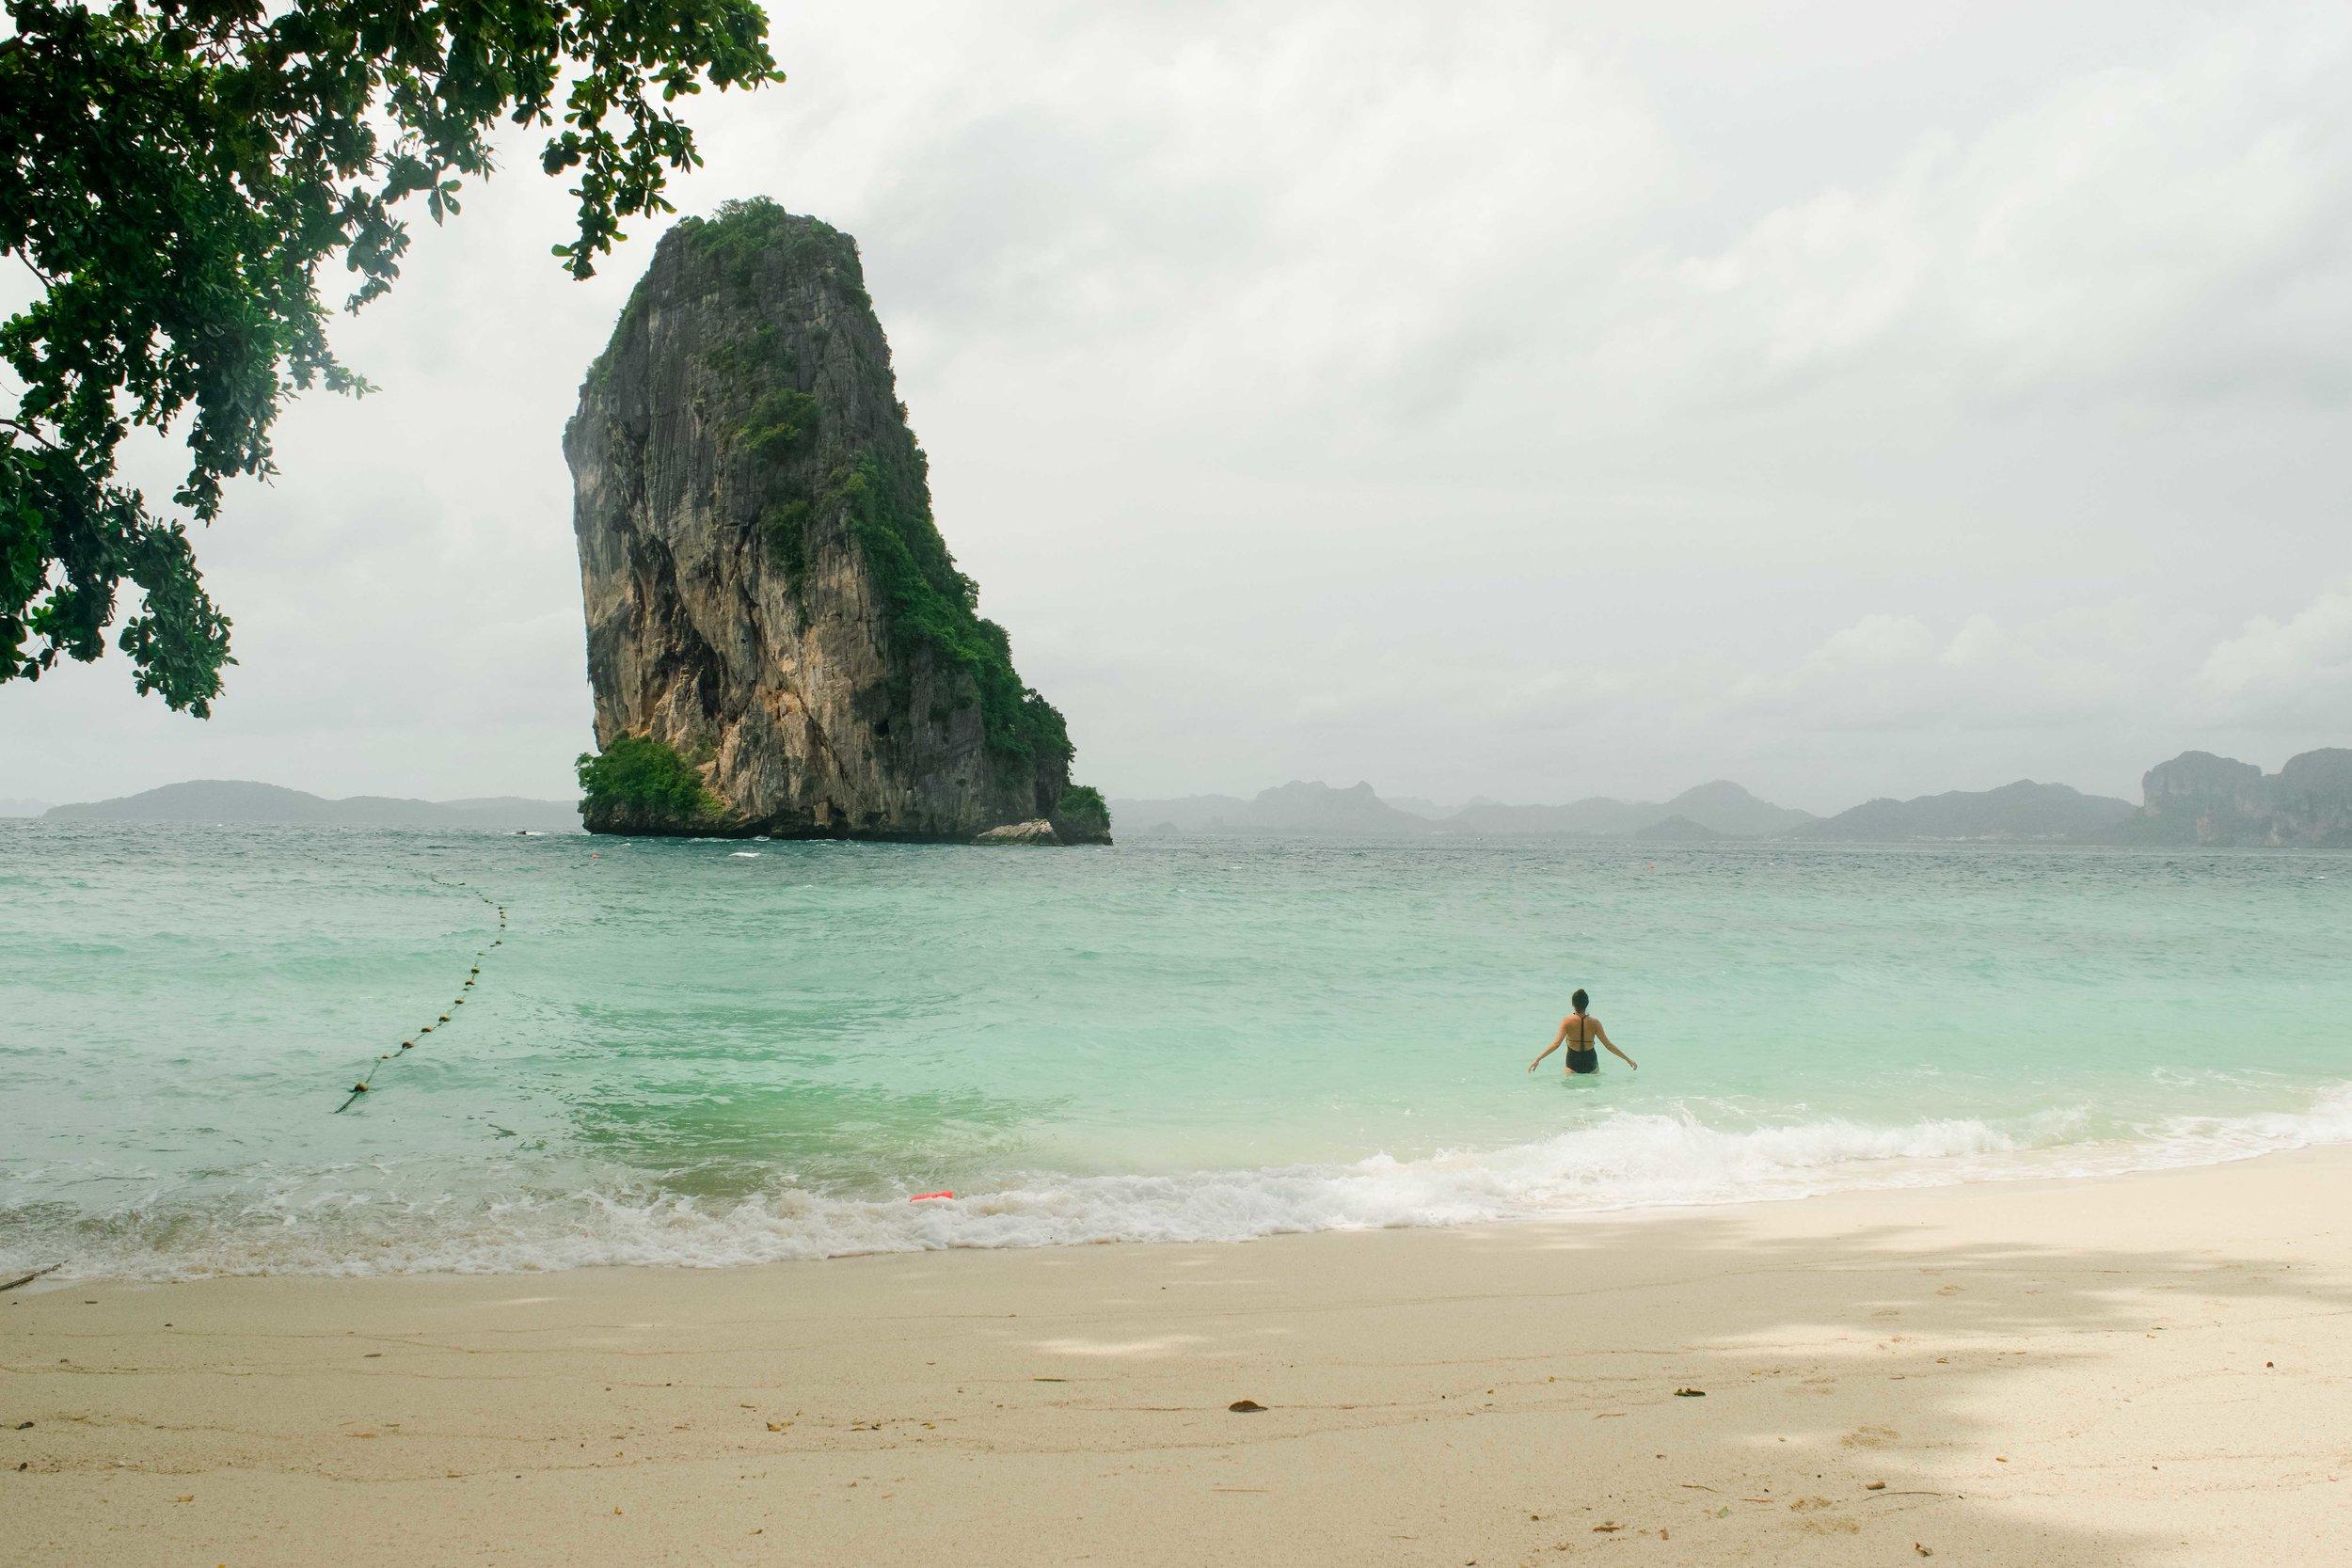 One of the best islands in all of Thailand - Poda Island near Krabi